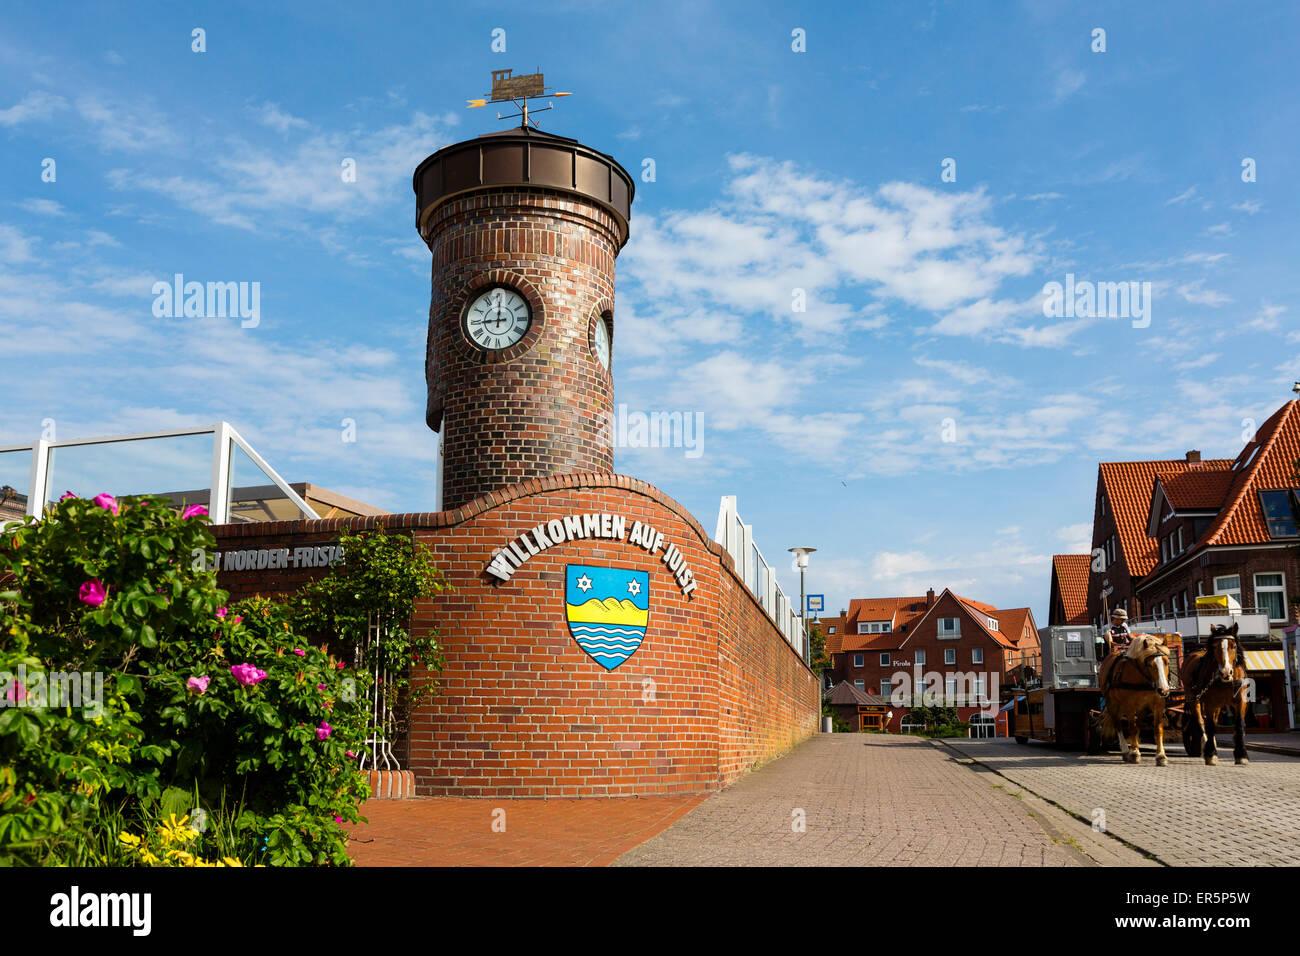 Small lighthouse with emblem, Juist Island, Nationalpark, North Sea, East Frisian Islands, East Frisia, Lower Saxony, - Stock Image